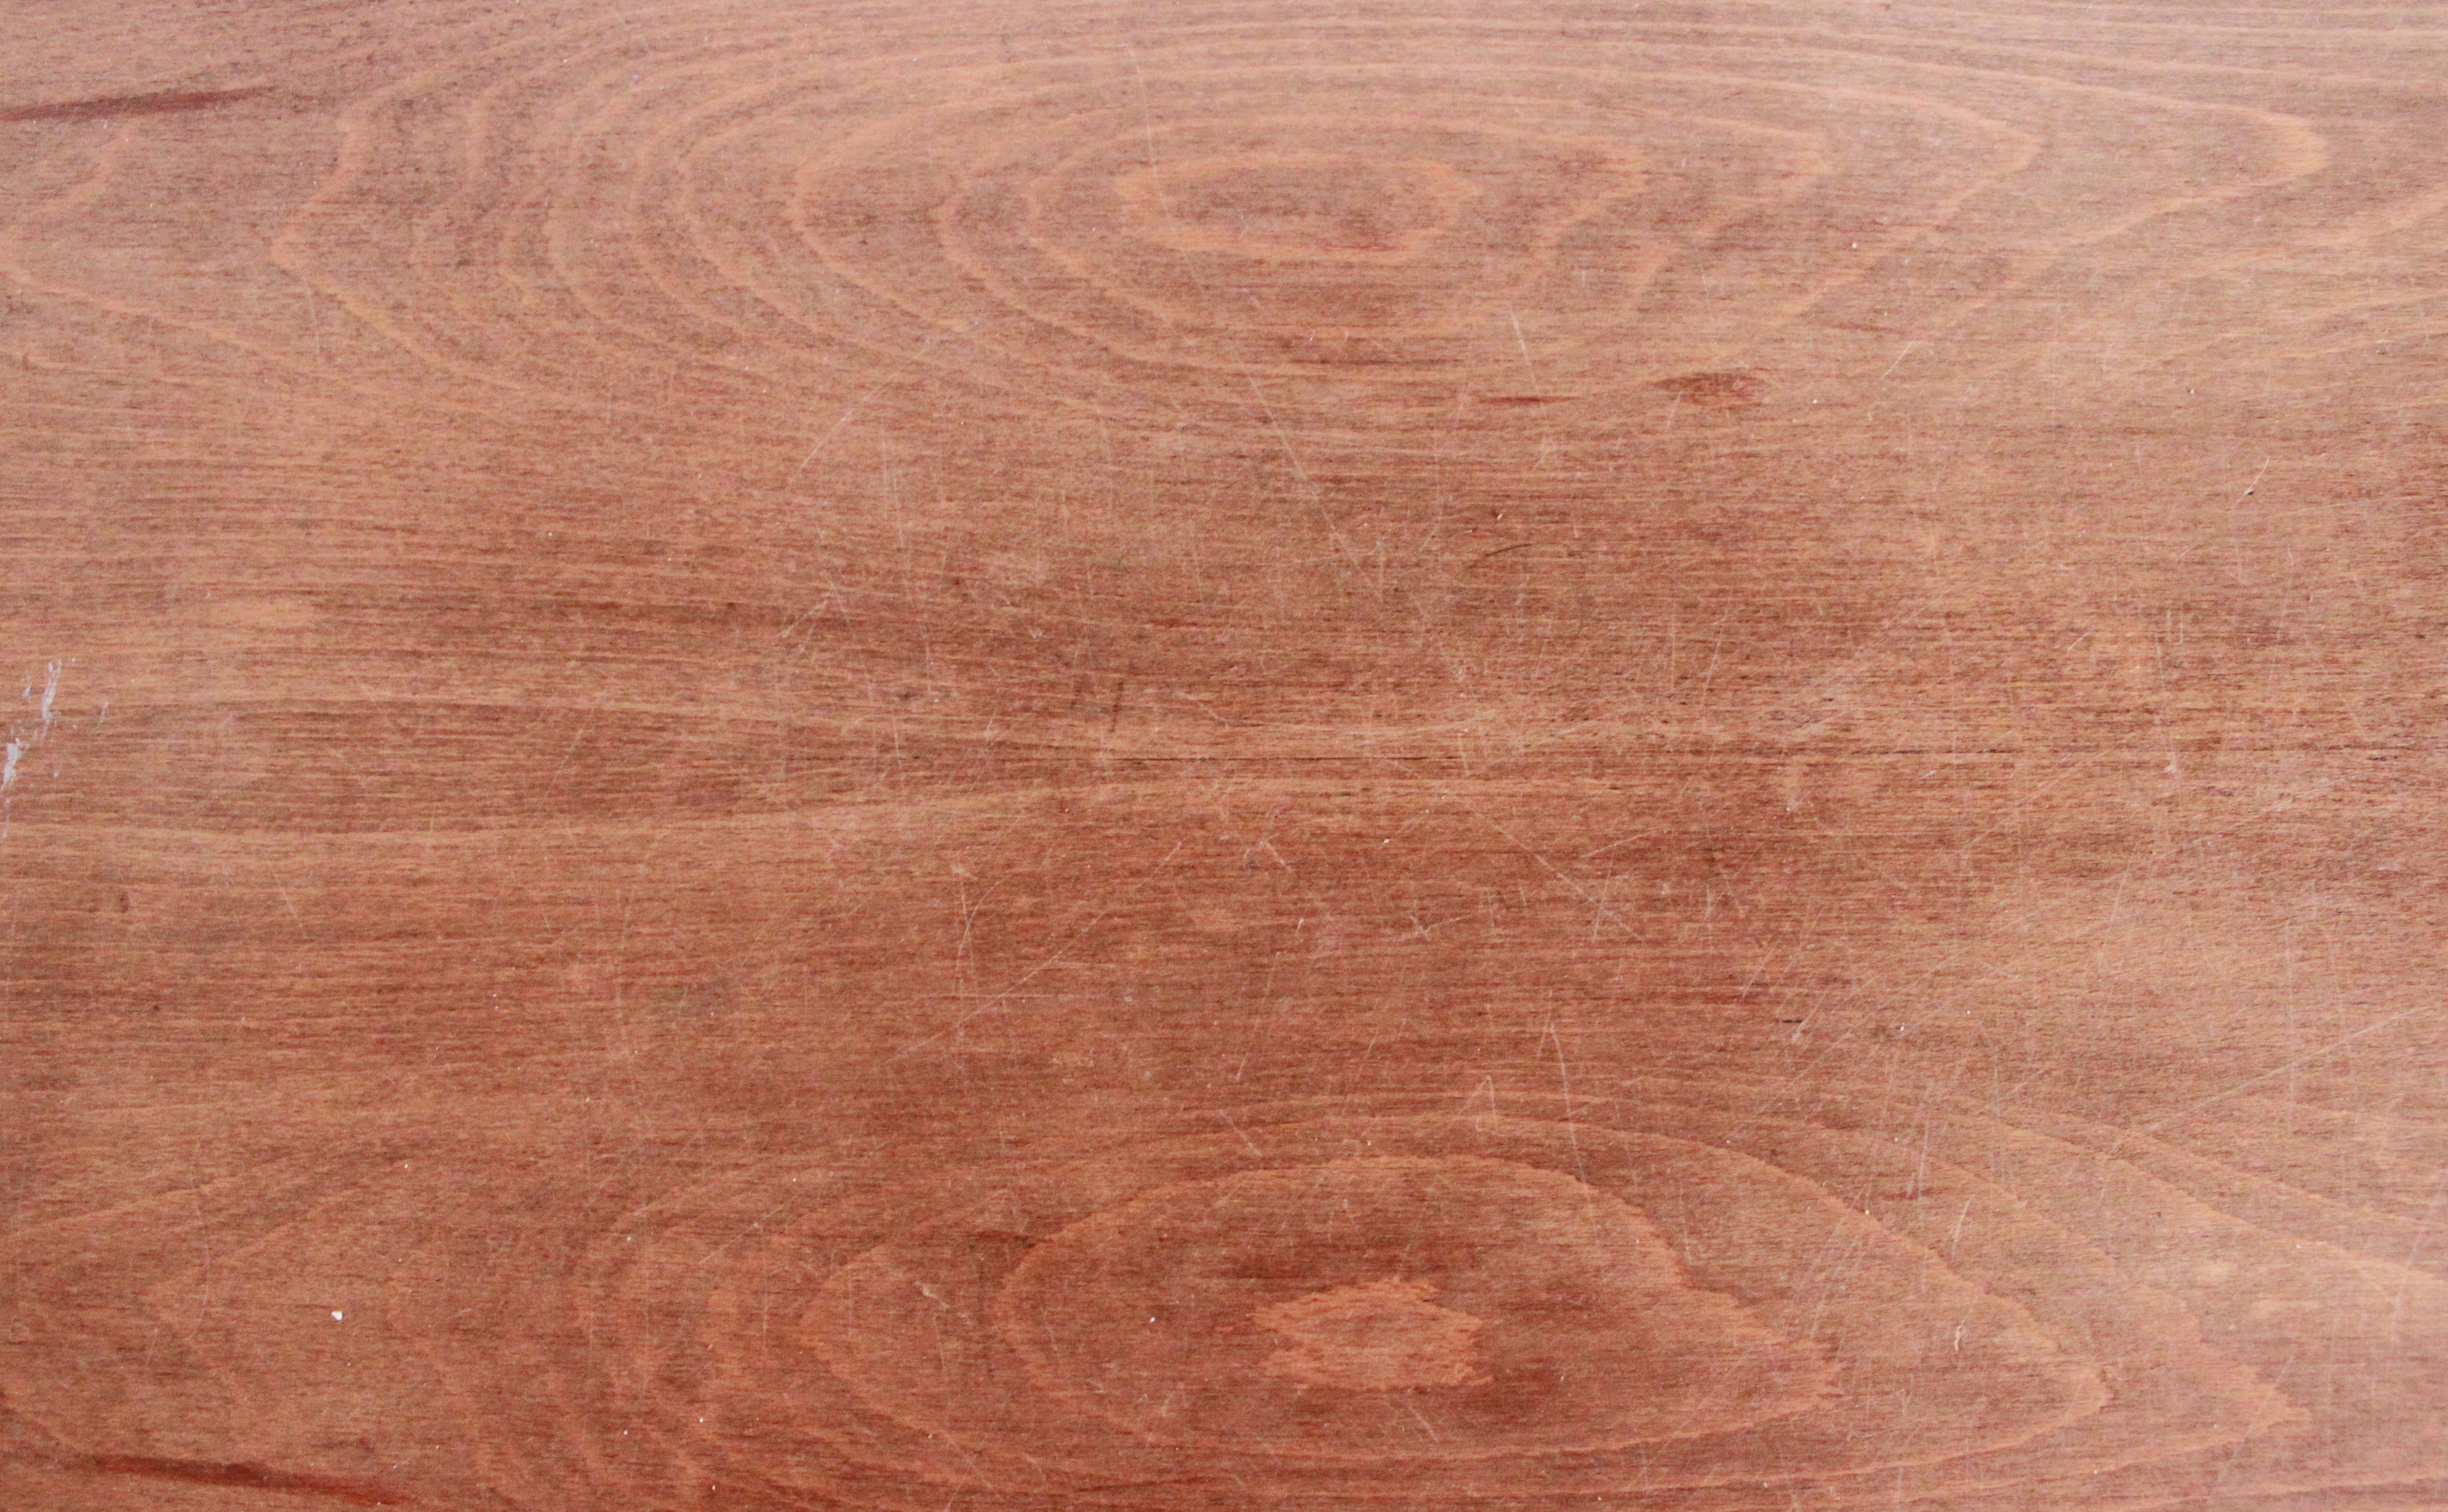 wooden texture, wooden texture